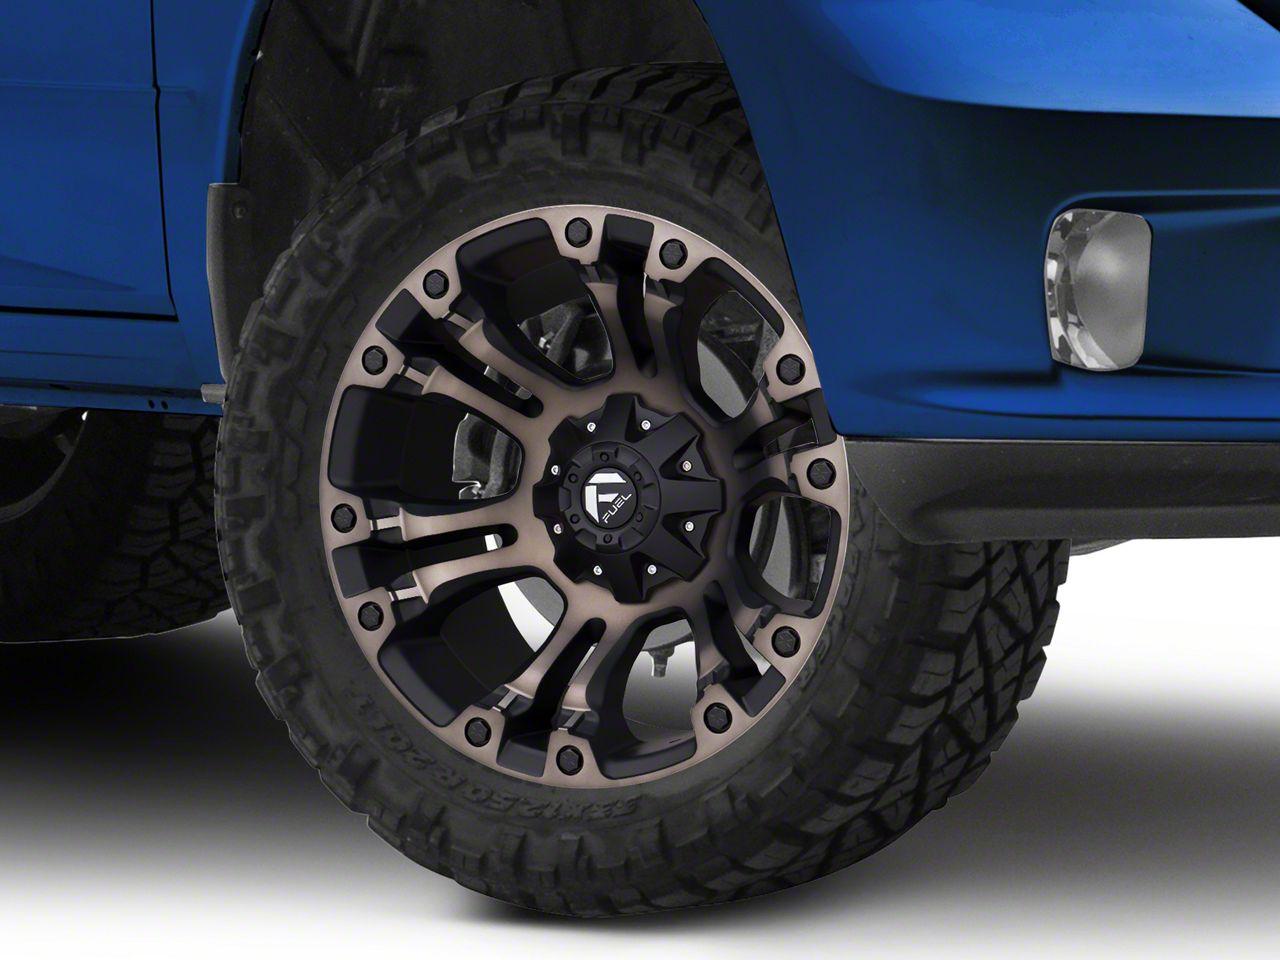 Fuel Wheels Vapor Black Machined w/ Dark Tint 5-Lug Wheel - 20x10 (02-18 RAM 1500, Excluding Mega Cab)